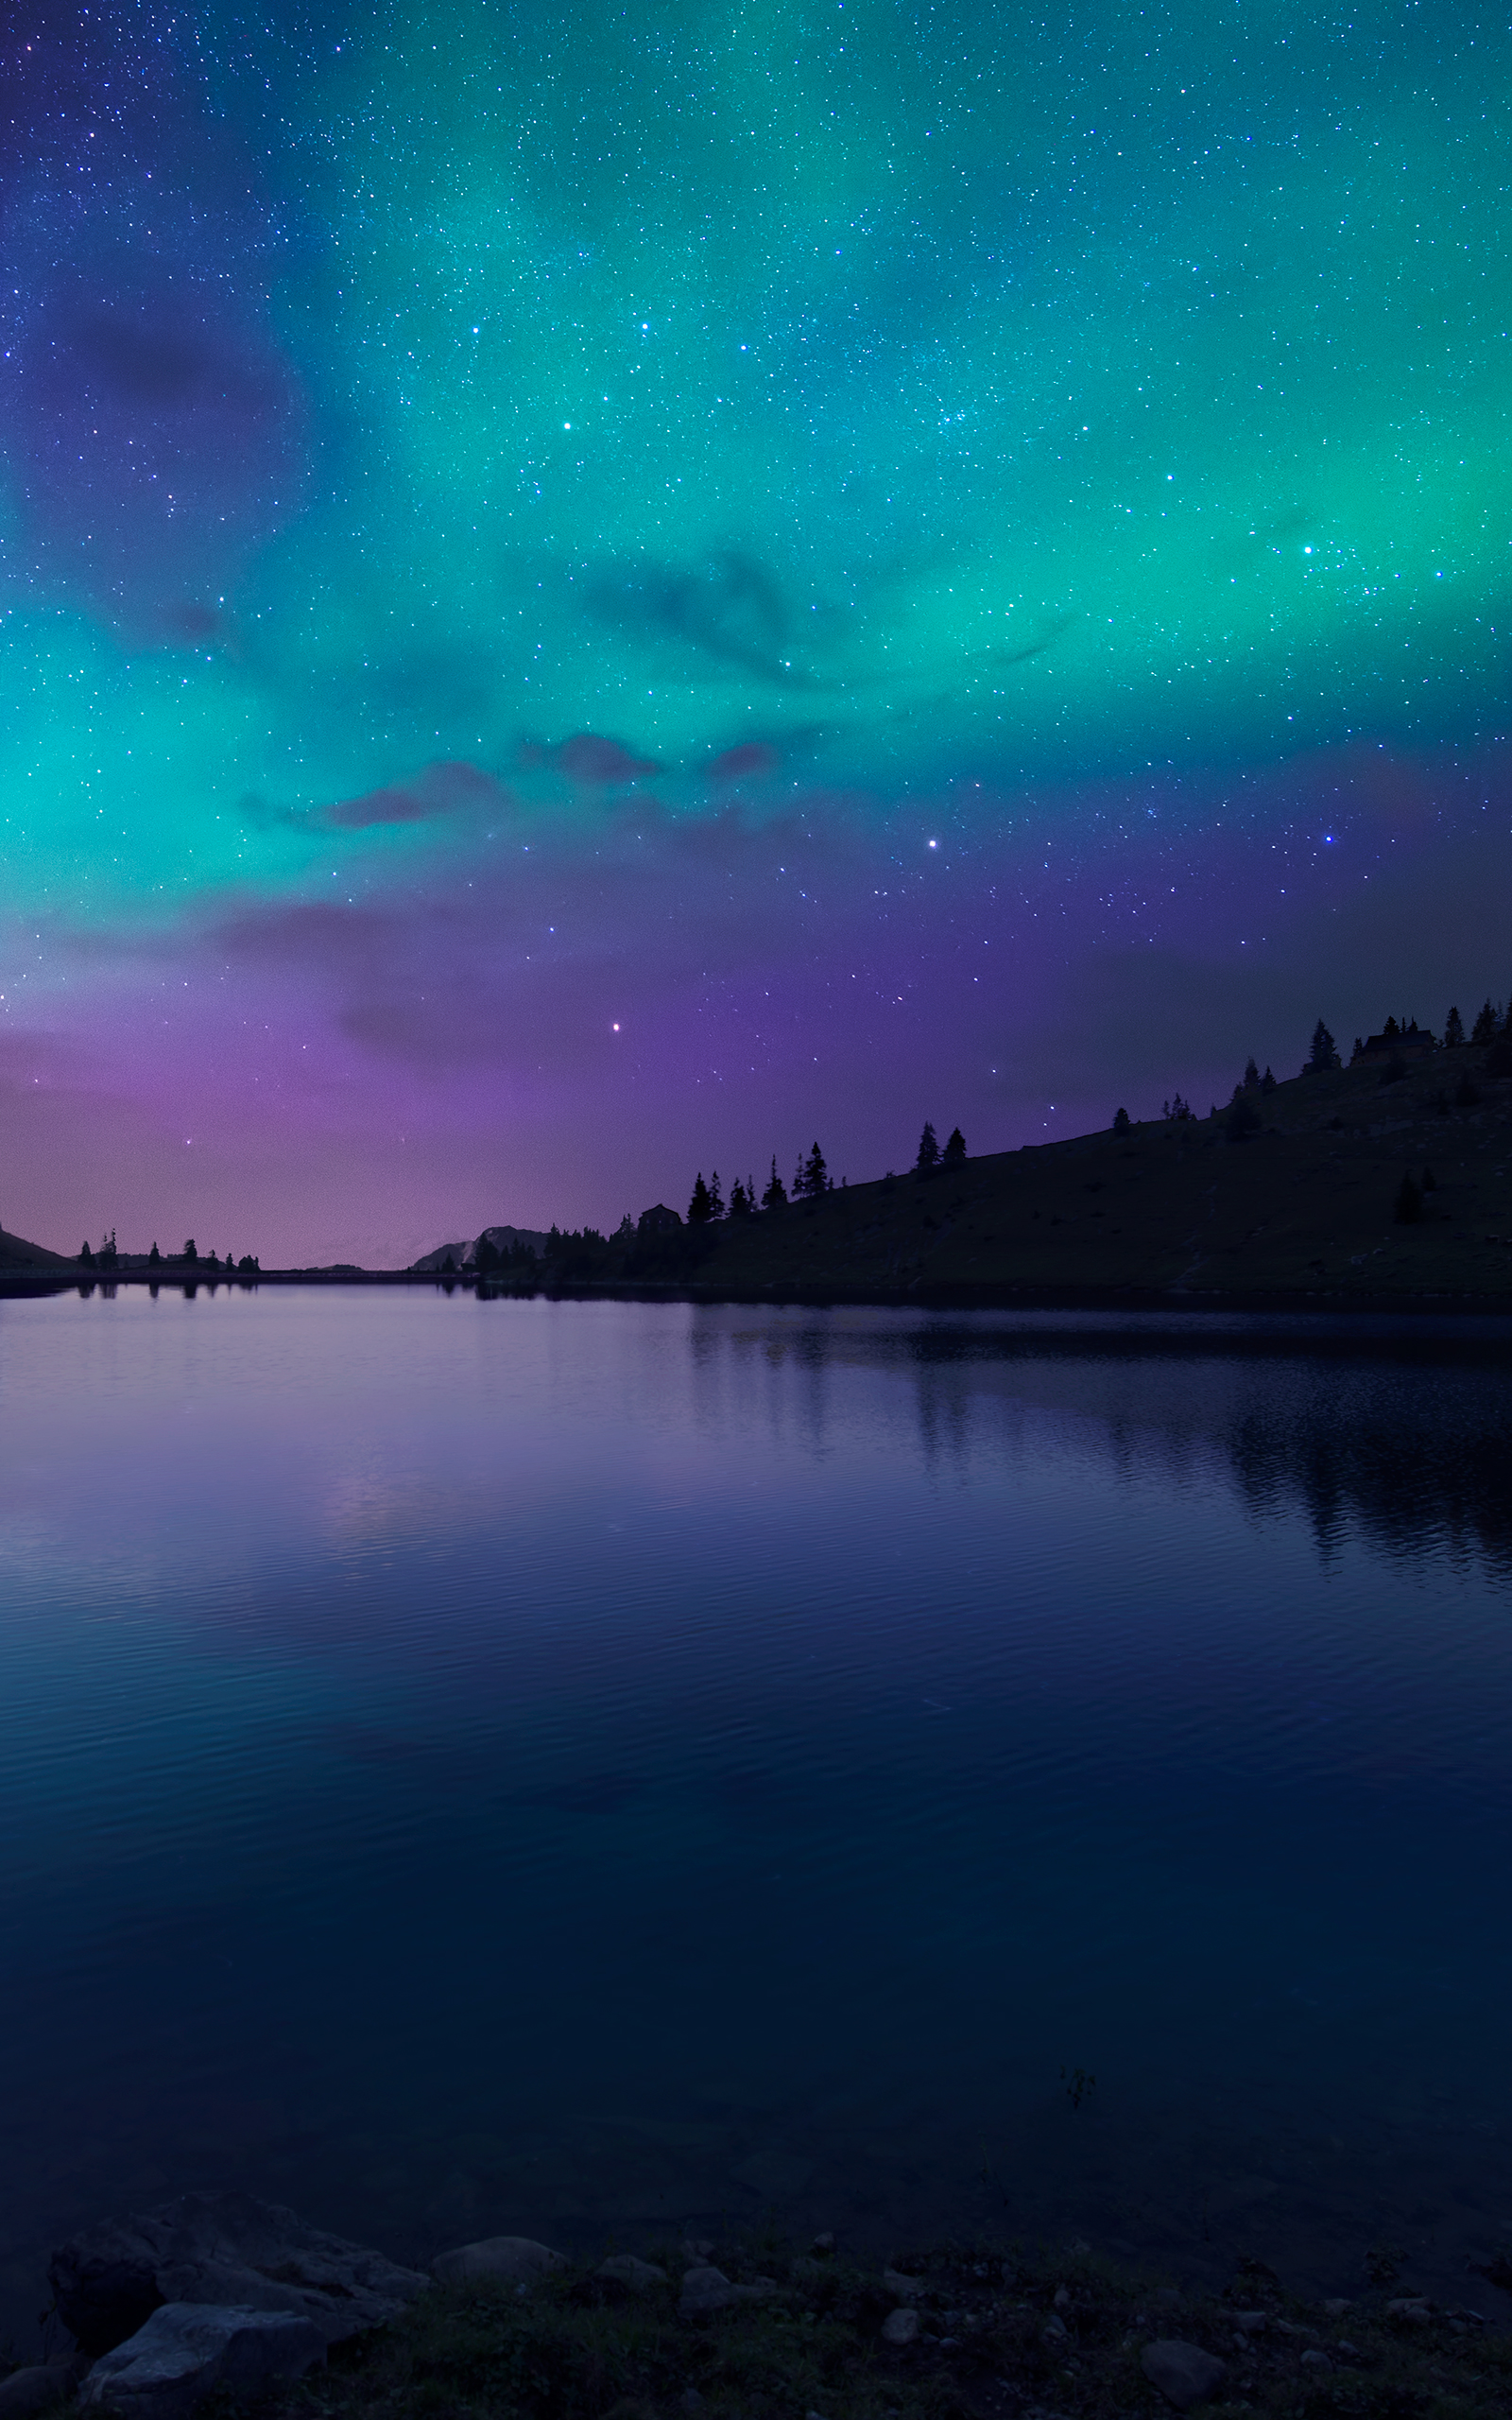 Night Fall At Lake Aurora Iphone 6 Plus Wallpaper - Nature Wallpaper Iphone - HD Wallpaper